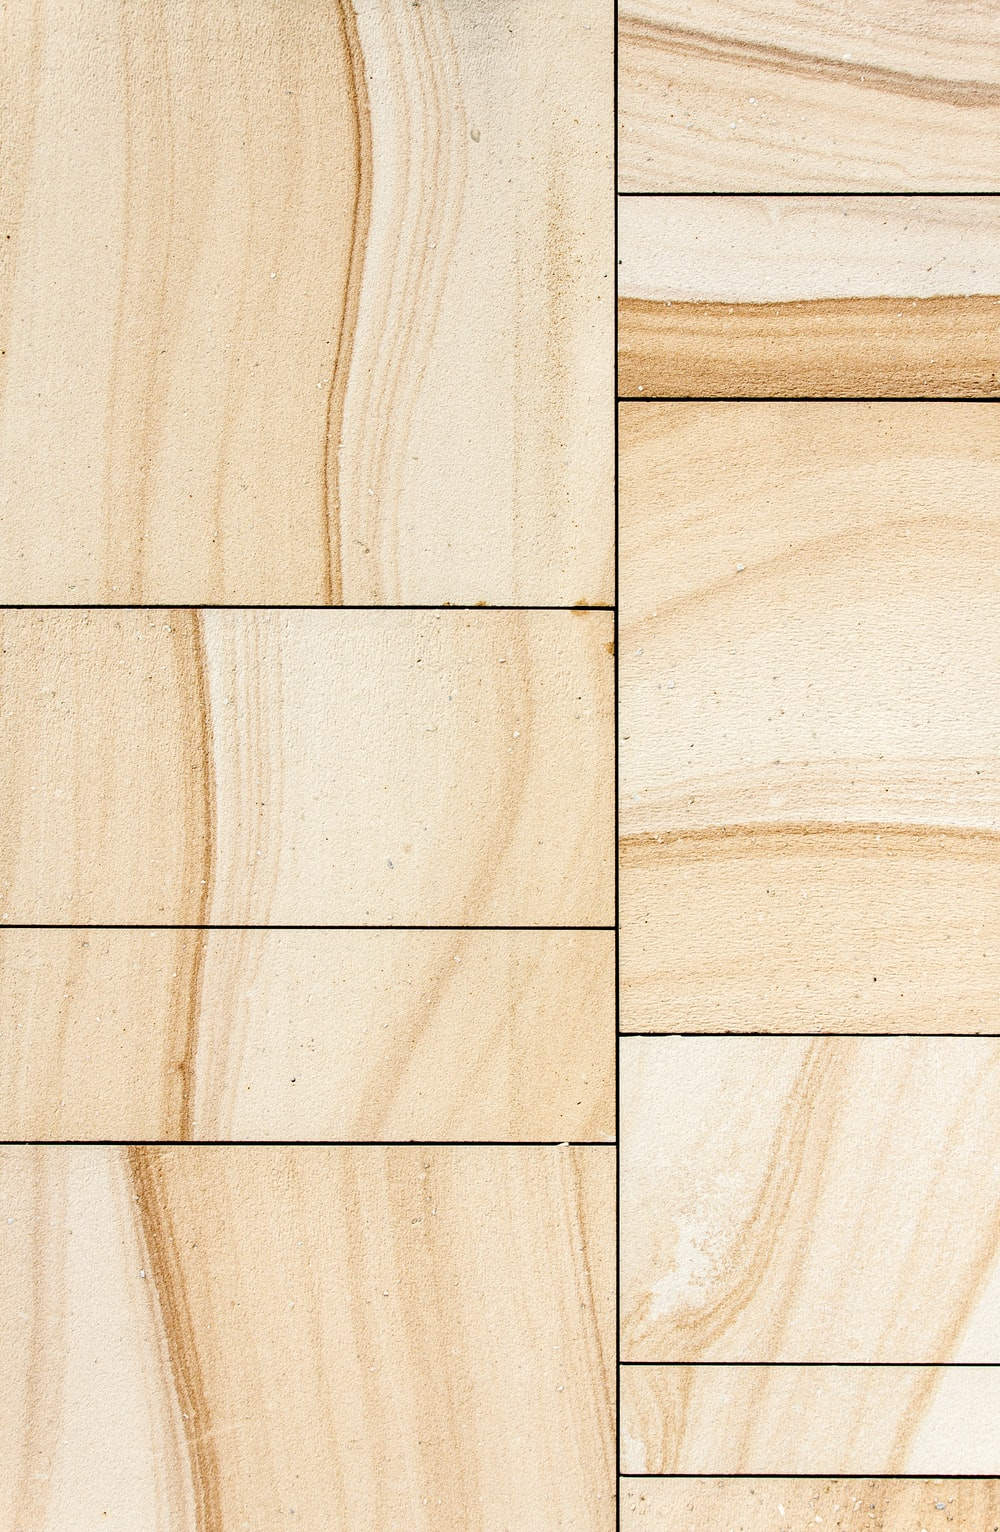 brown ceramic tiles collage